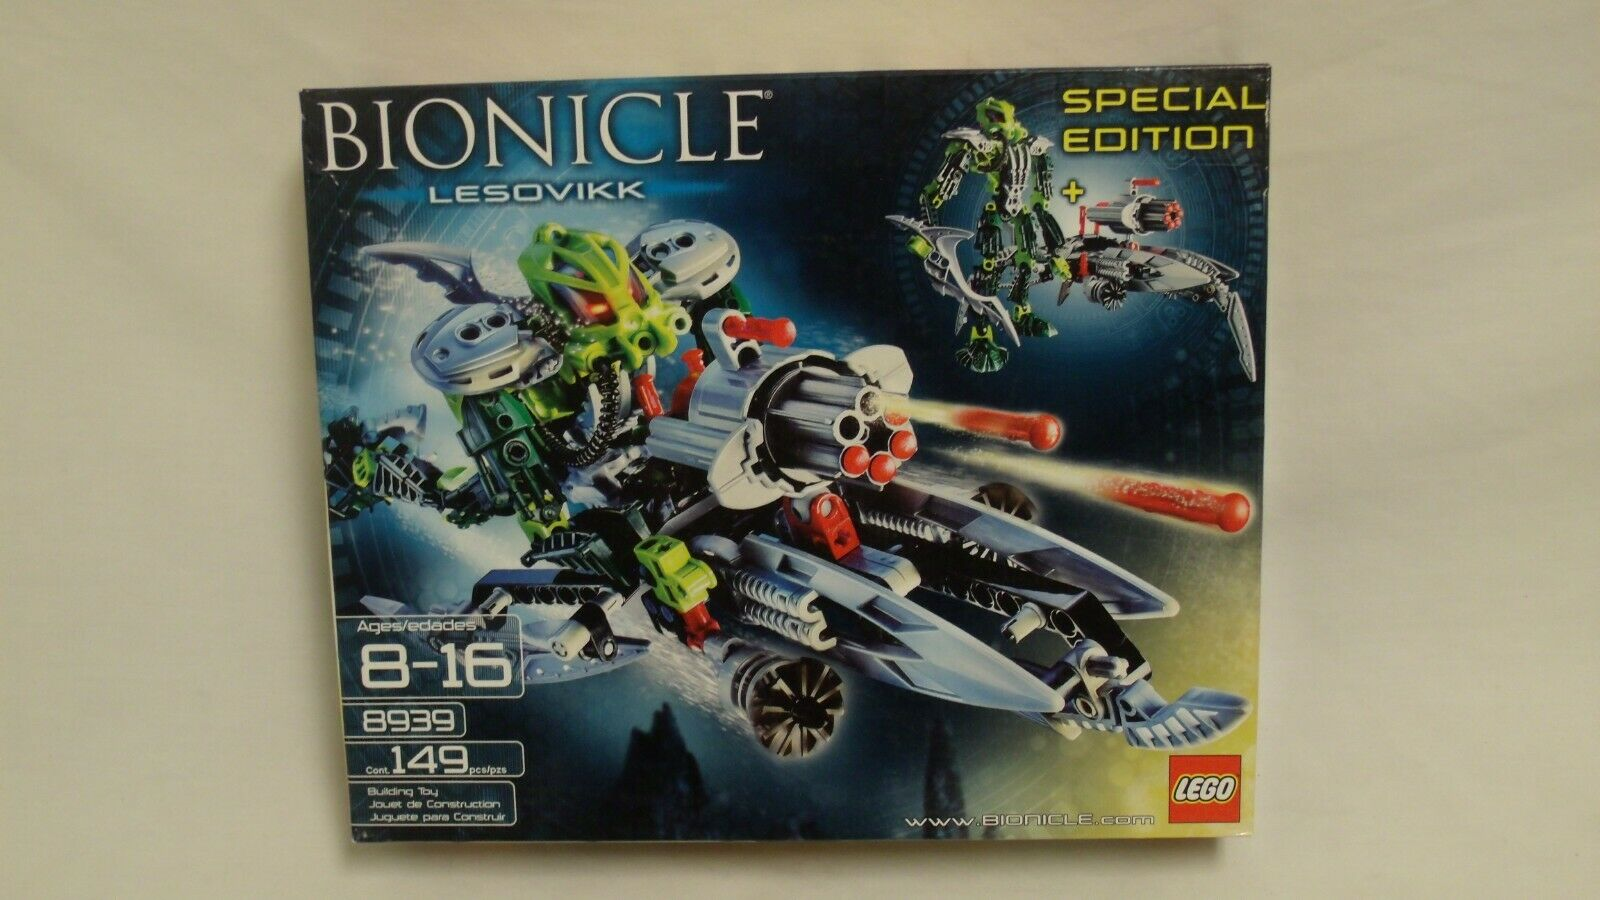 LEGO LEGO LEGO Bionicle Lesovikk Special Edition BRAND NEW 4d3c67